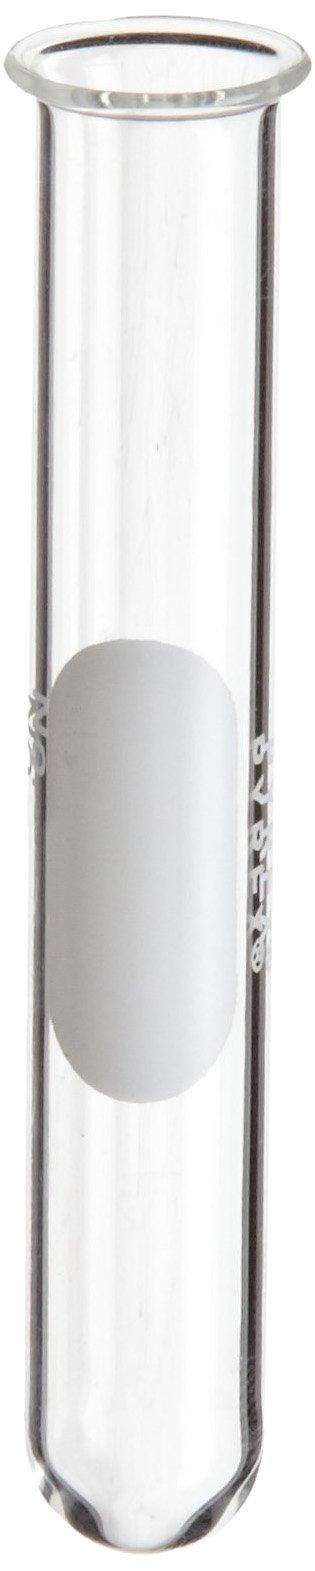 Corning Pyrex Borosilicate Glass Cylindrical Beaded Rim Test Tube, 20ml Capacity (Pack of 72)